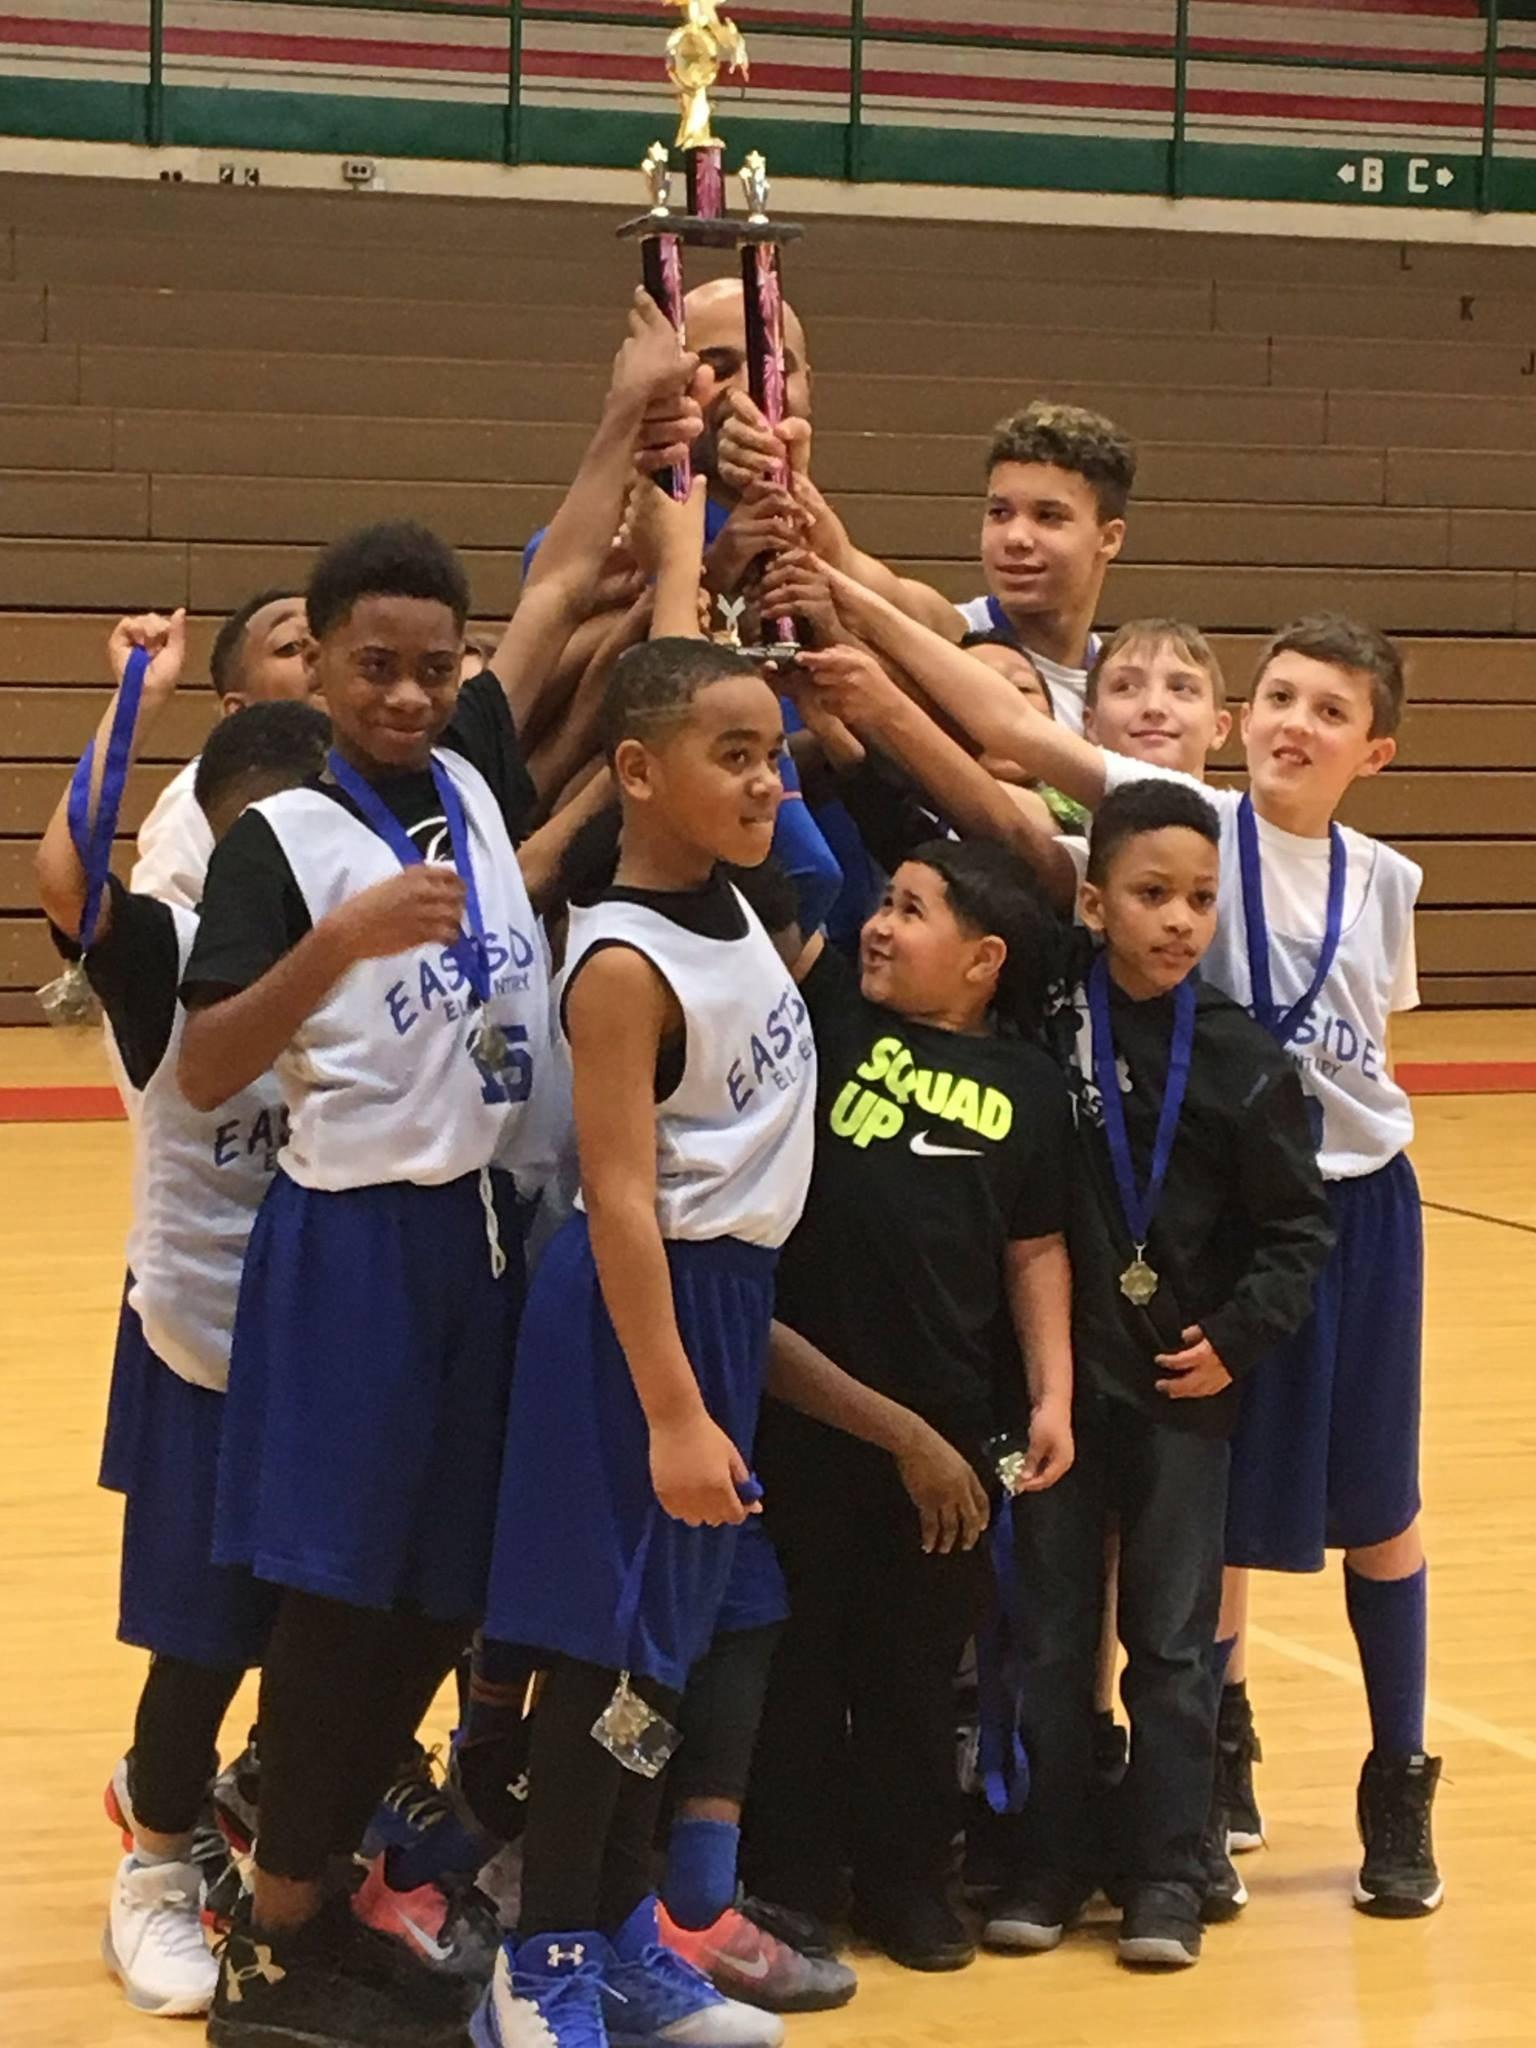 Boys Basketball Team Winners!